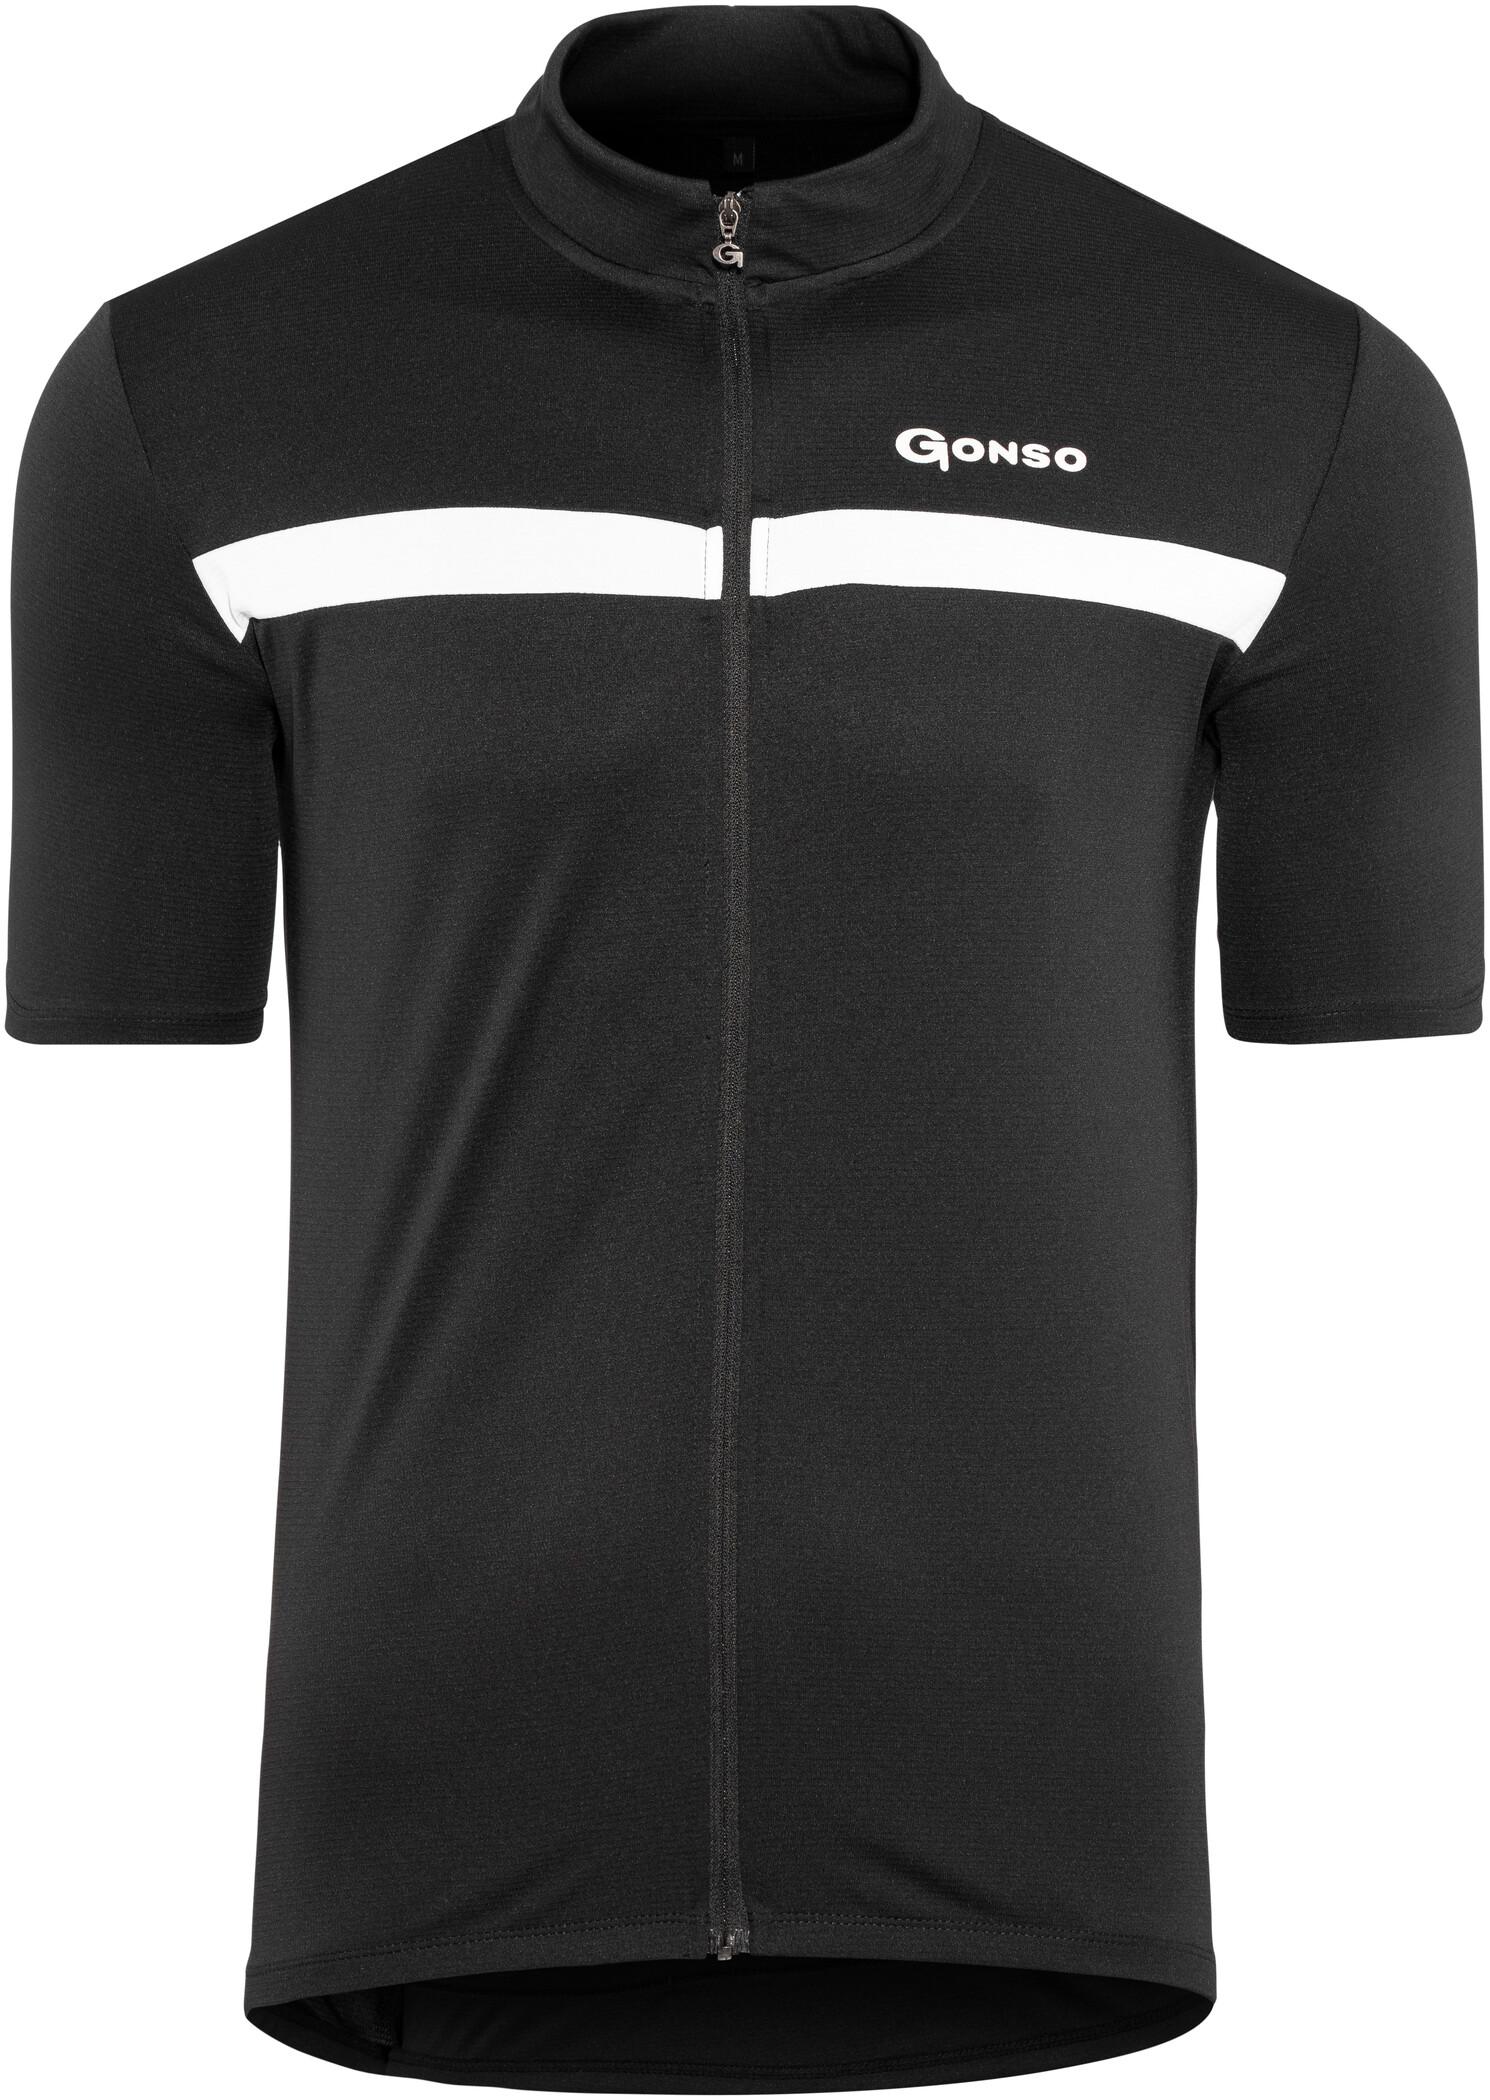 Gonso Artur Kortærmet cykeltrøje Herrer, black | Jerseys